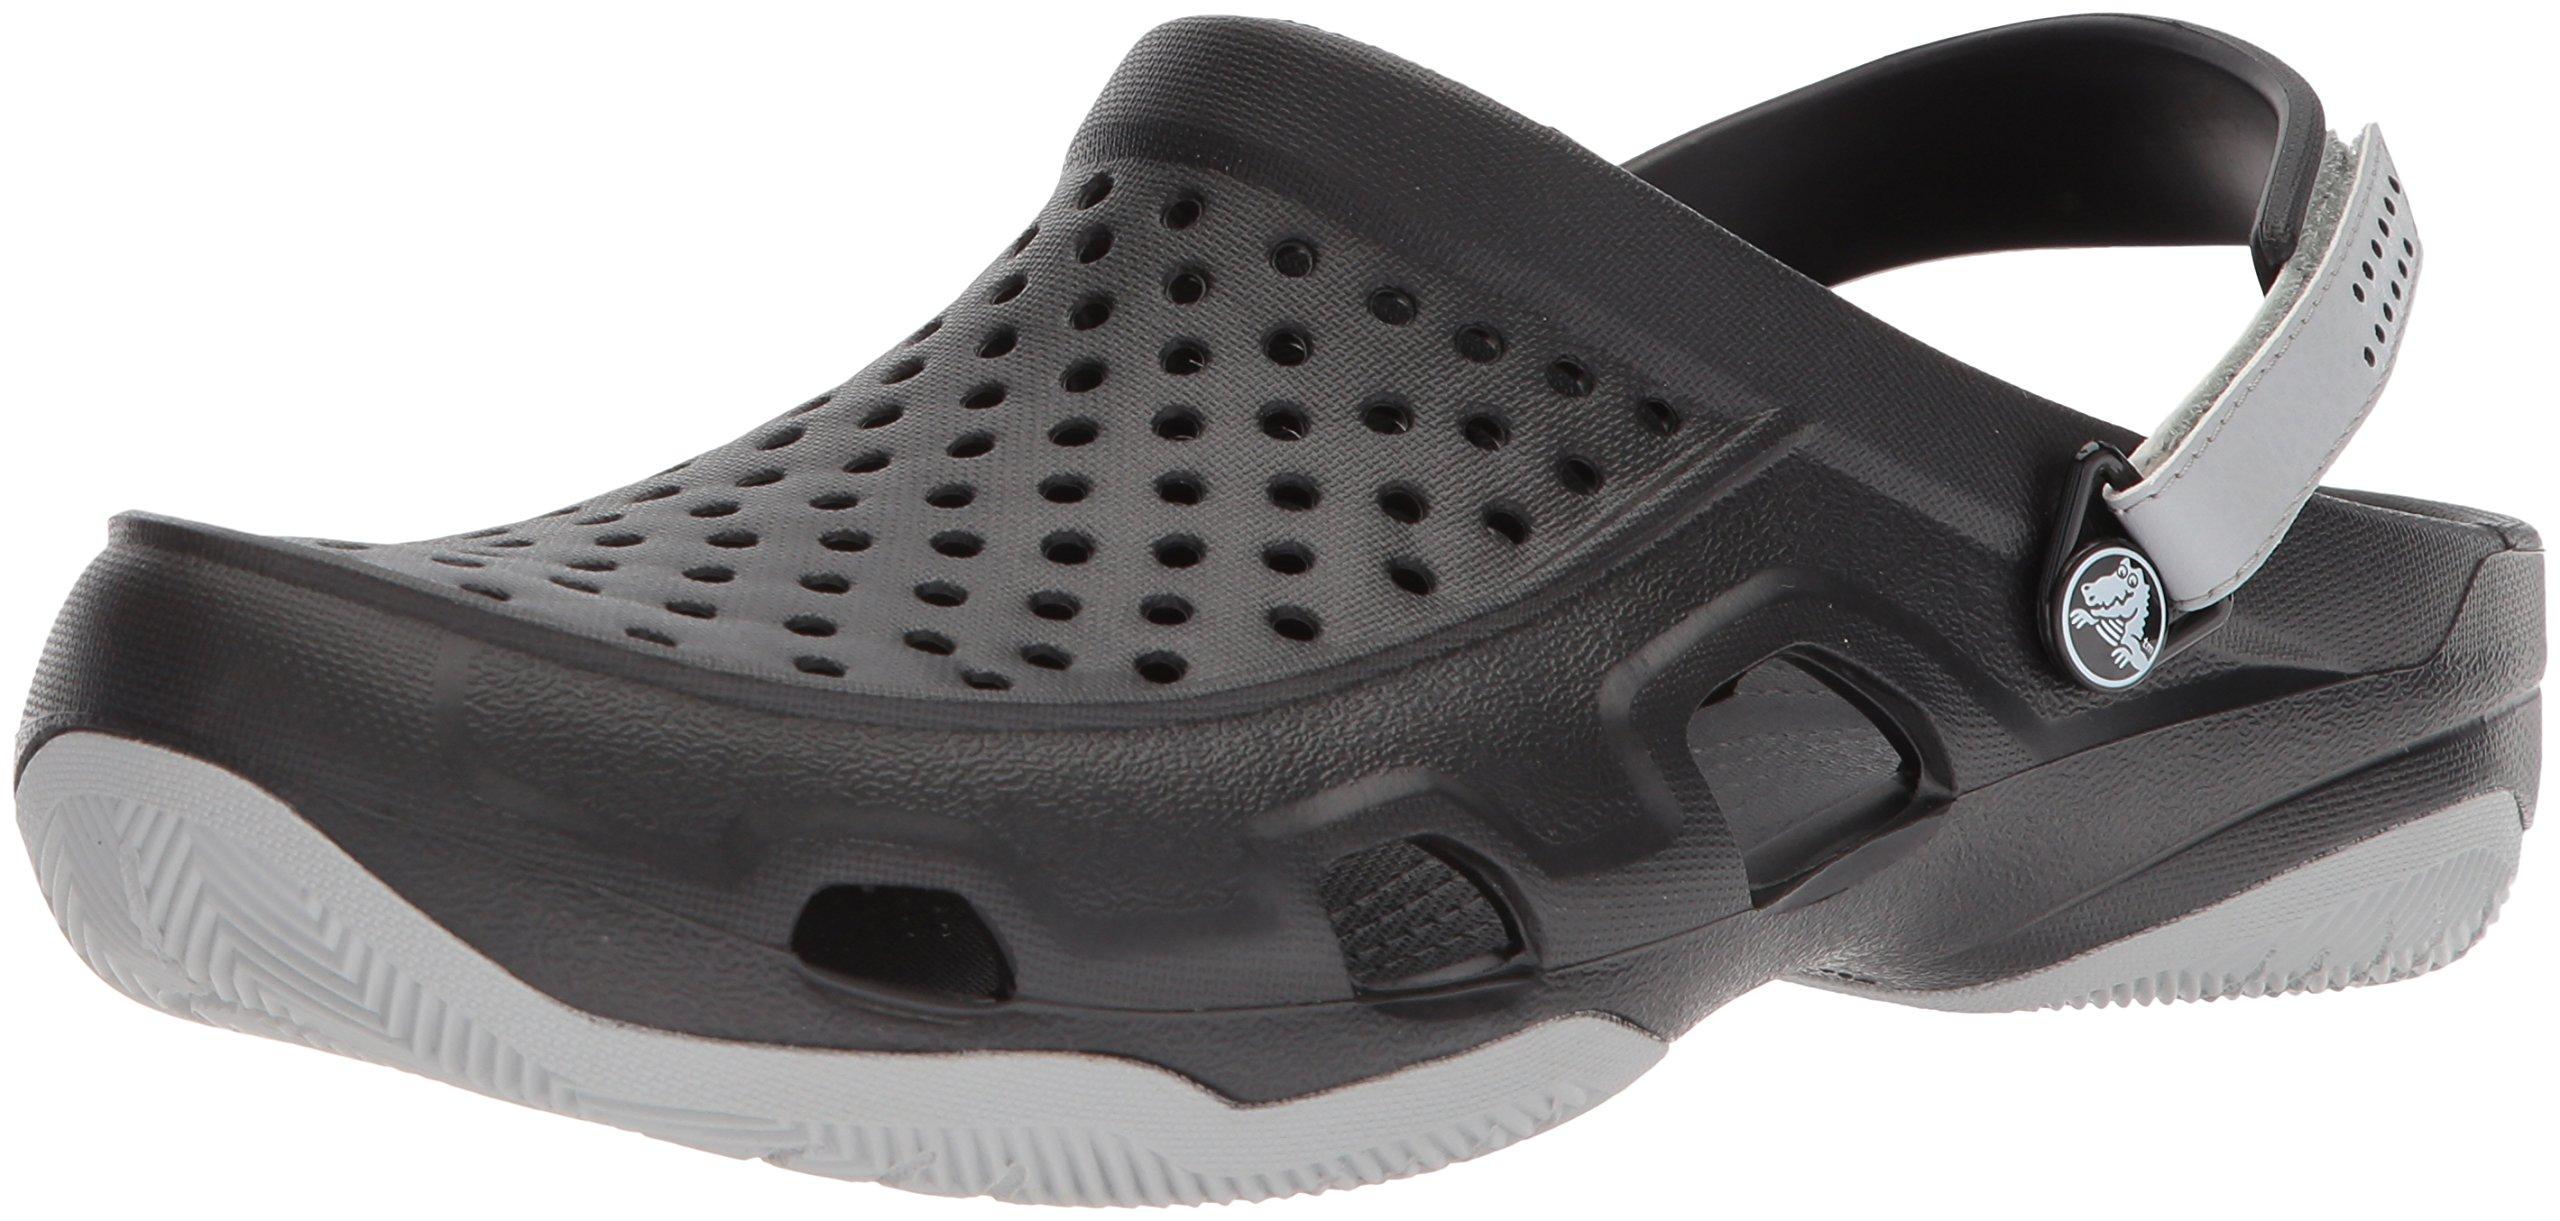 Crocs Men's Swiftwater Deck Clog M Mule, Black/Light Grey, 12 M US